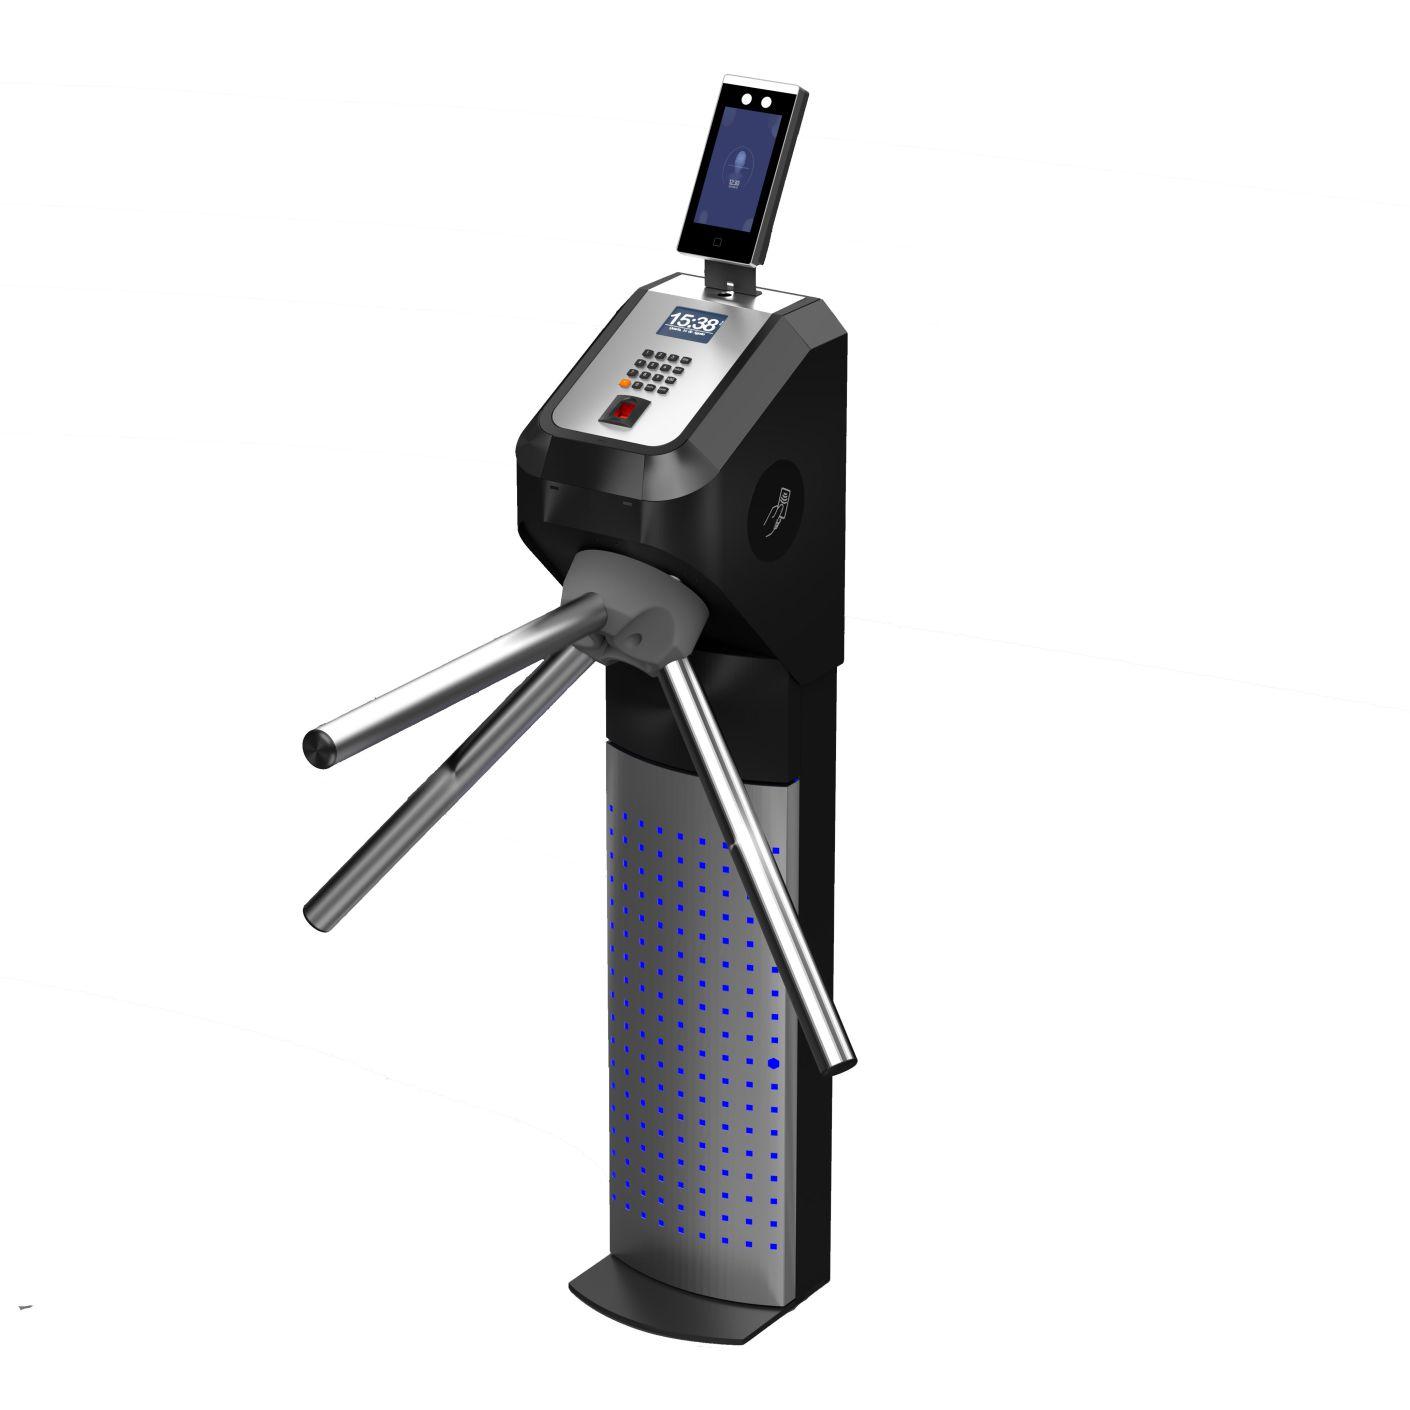 Catraca Eletrônica Biometria Facial Lumen Advance 1000 Faces